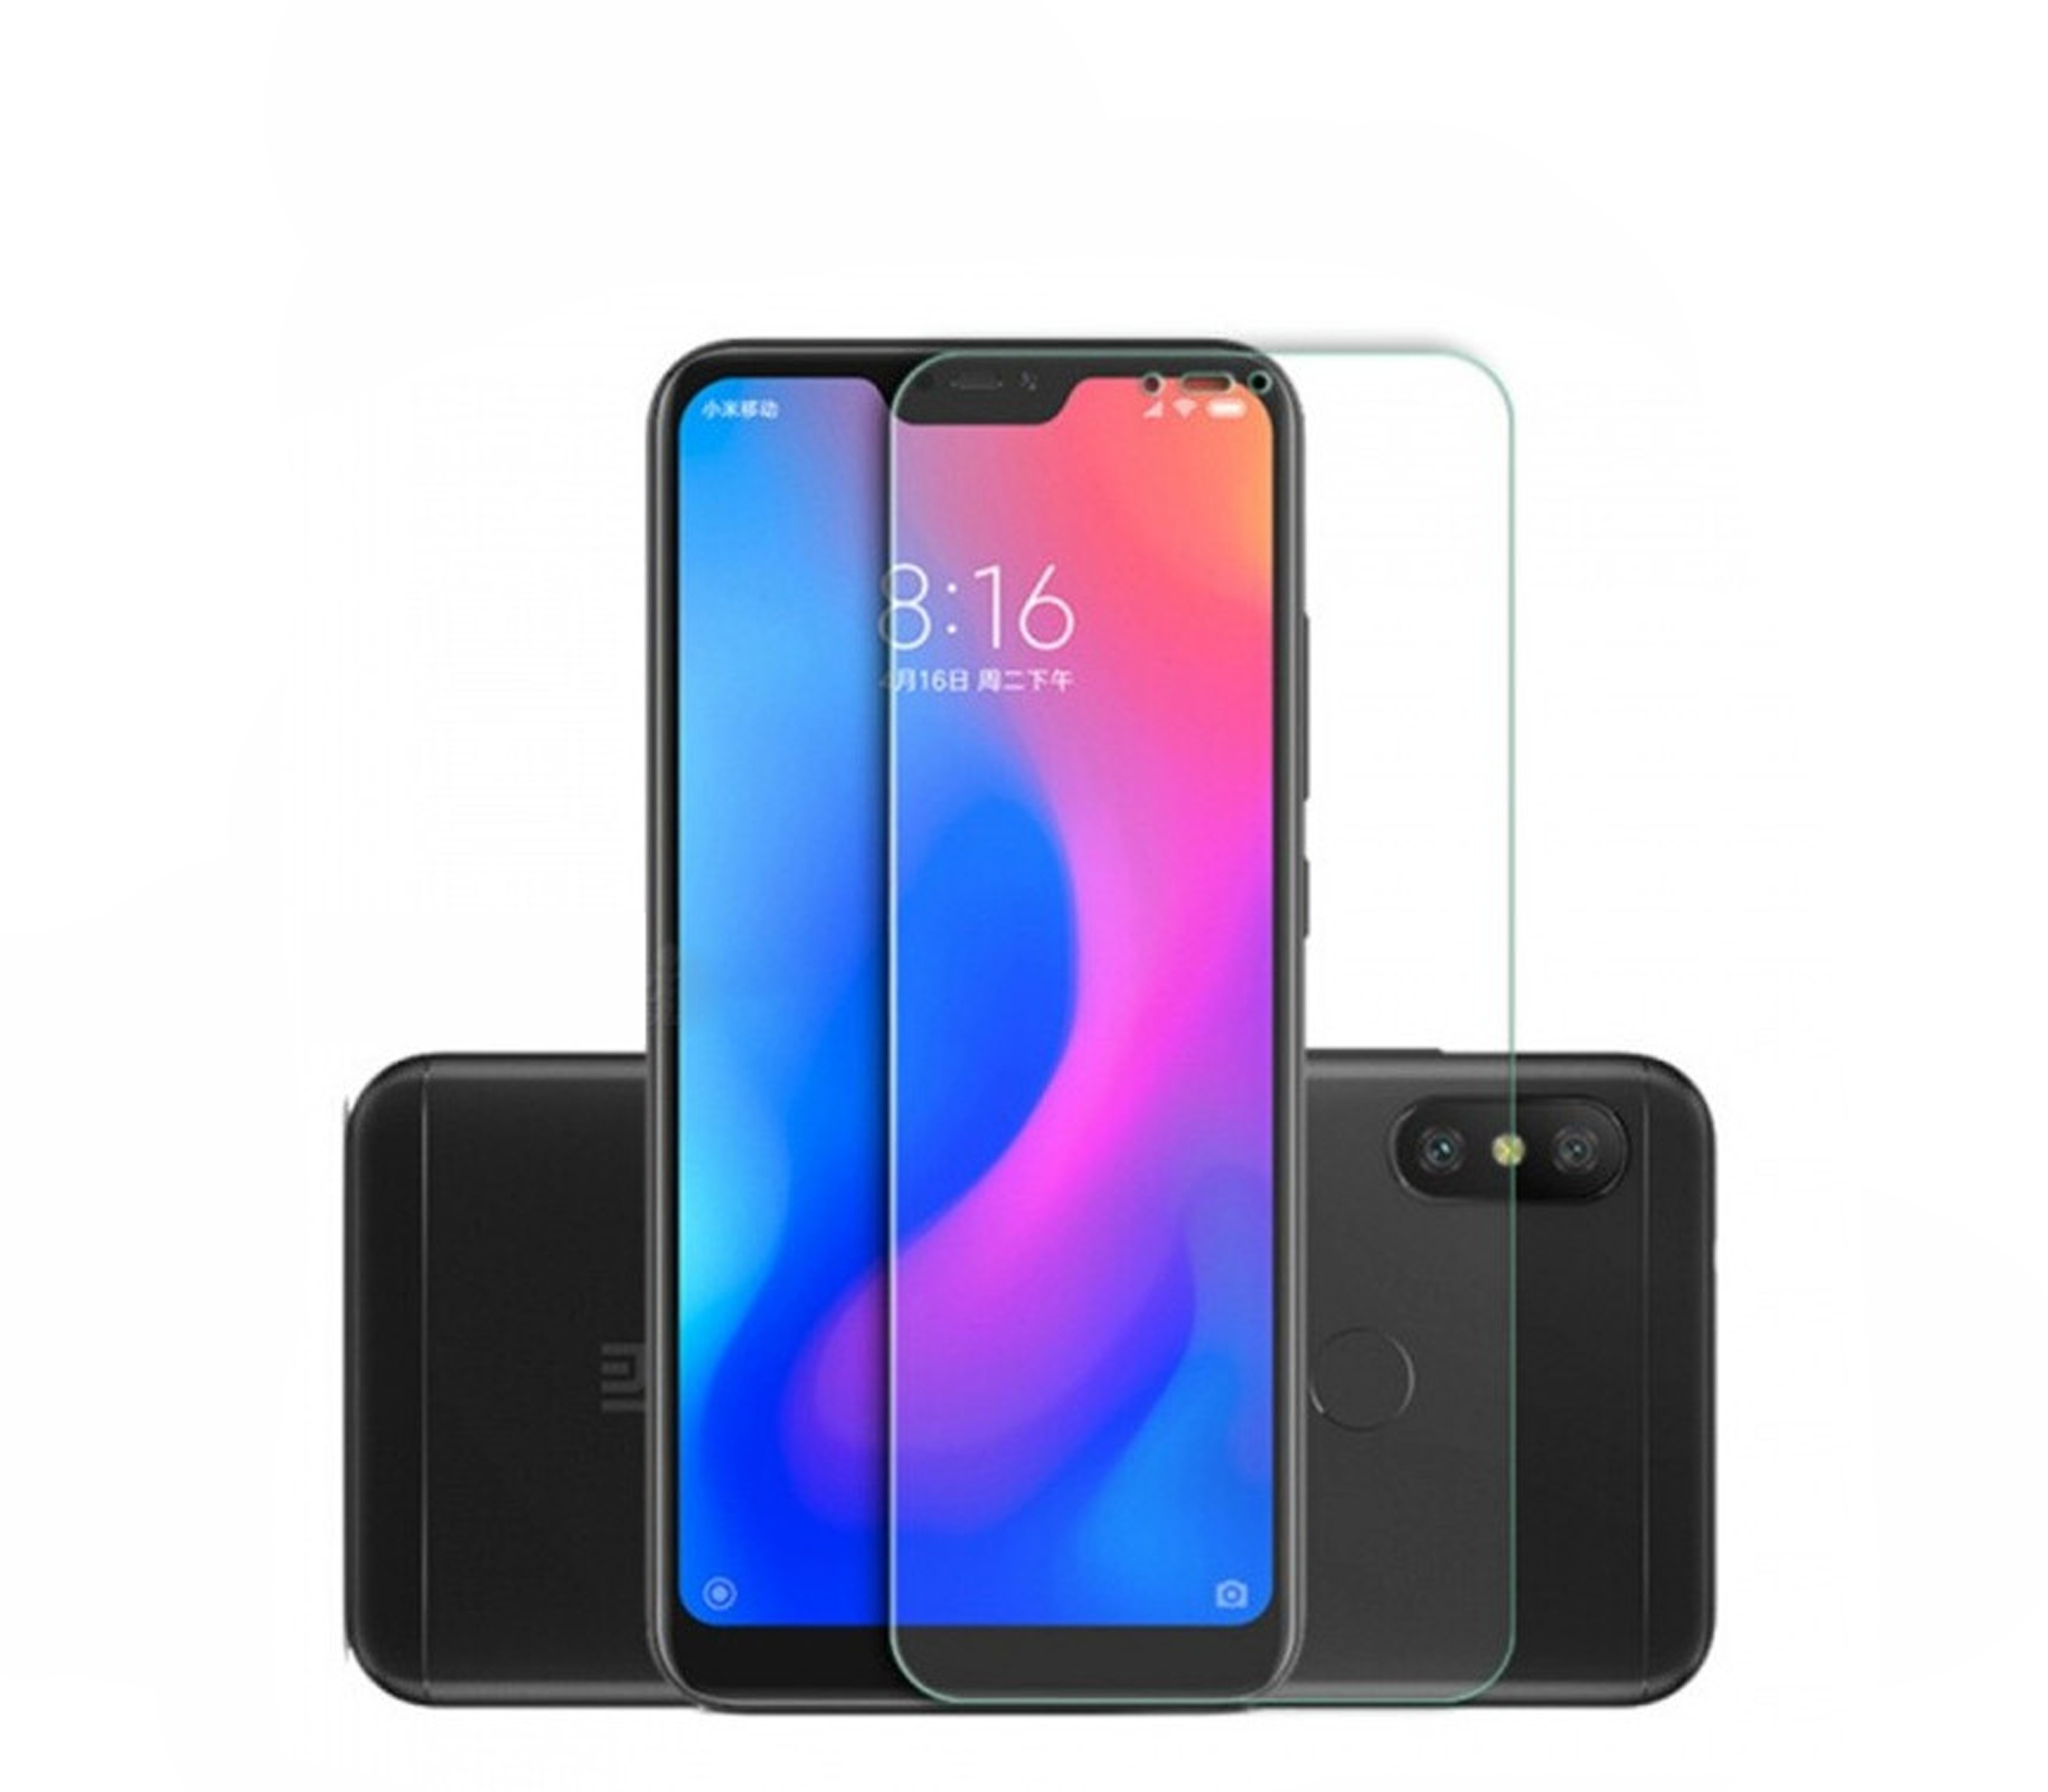 Aga Tvrzené sklo pro Xiaomi Mi A2 Lite